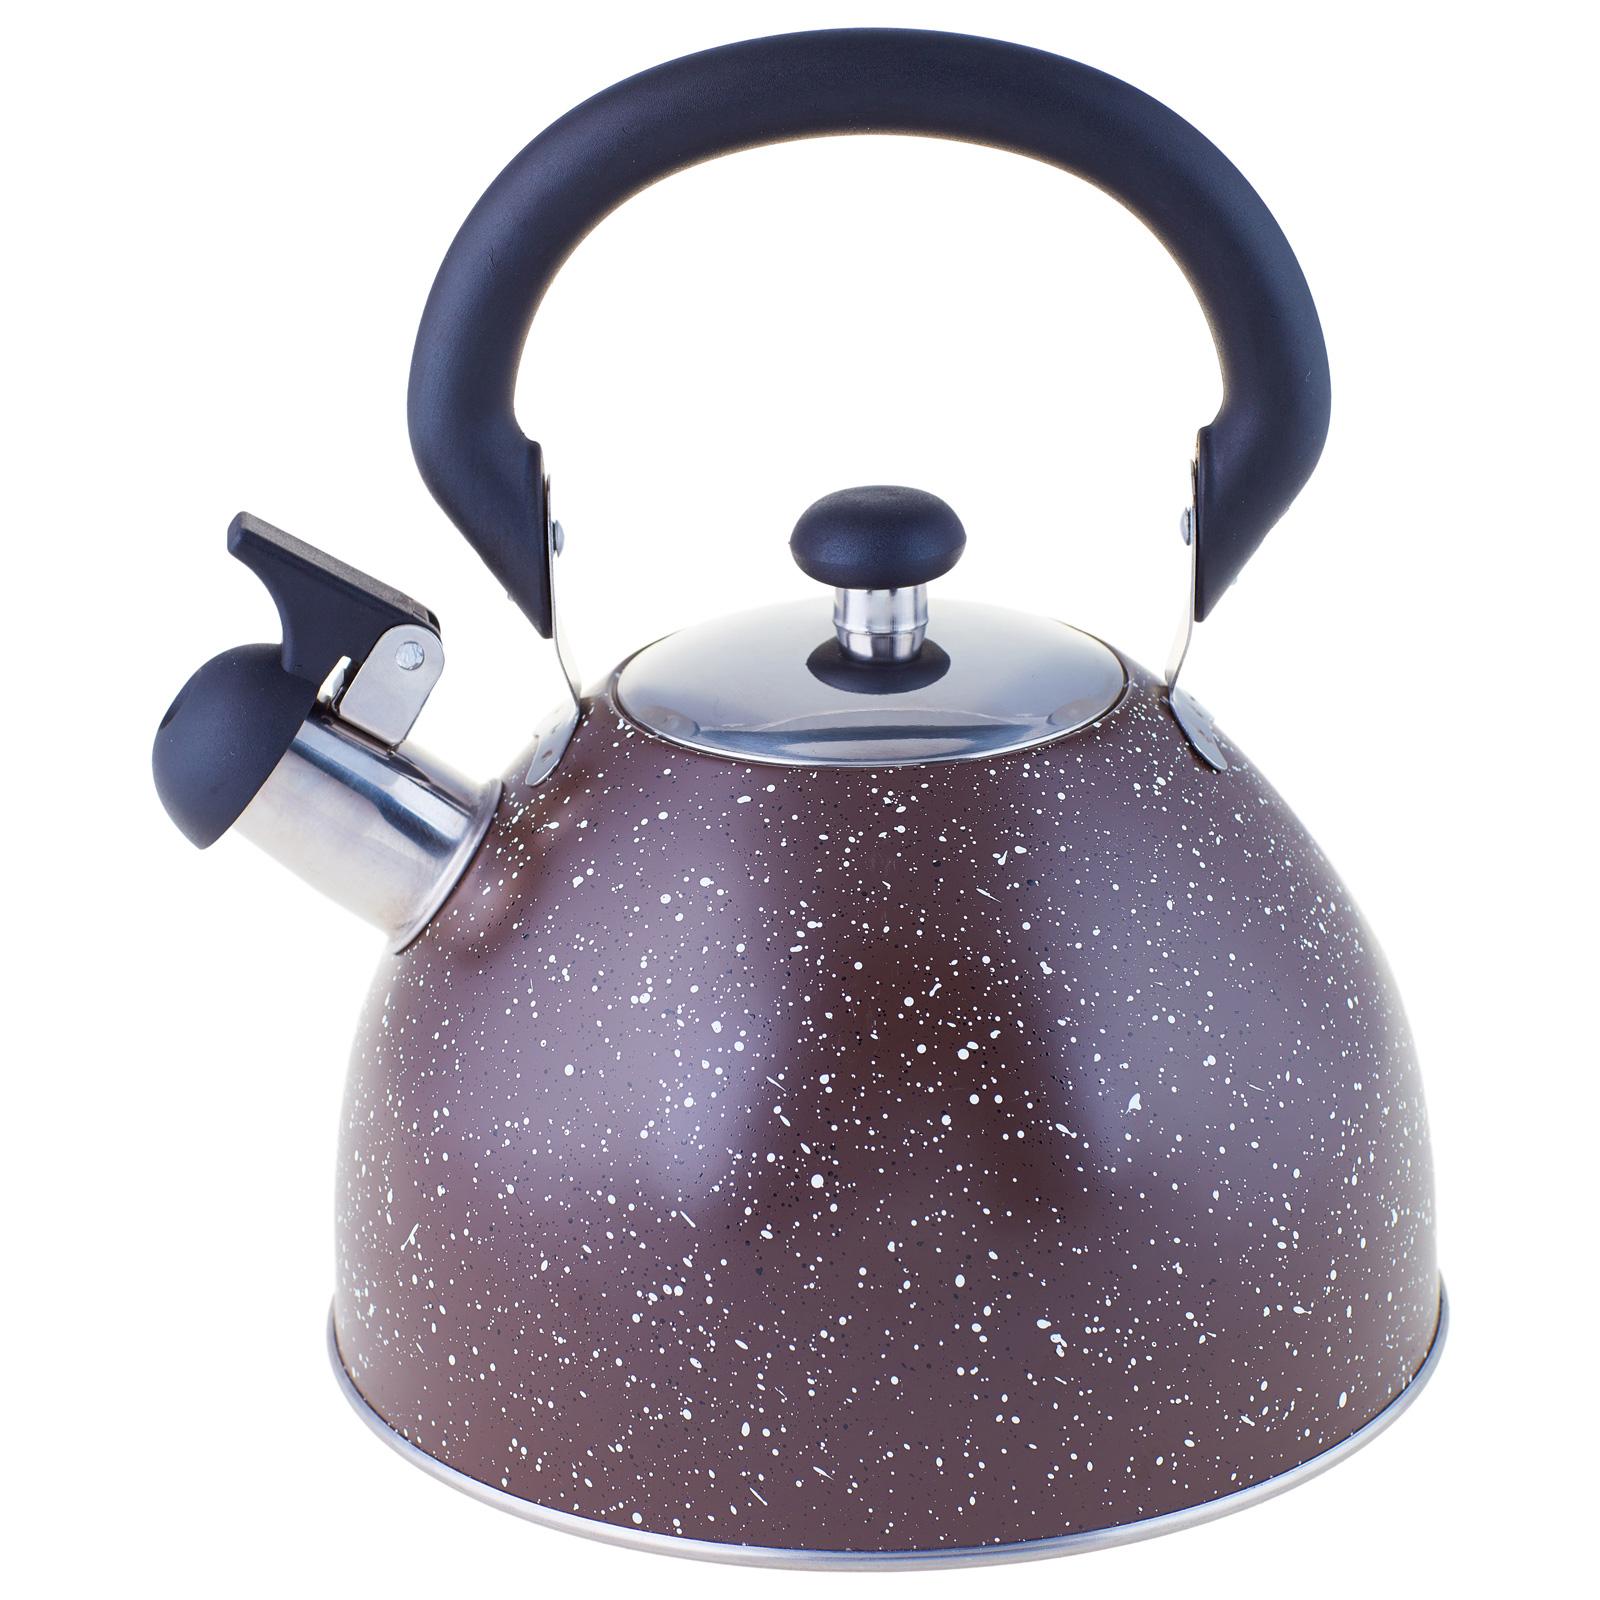 Чайник со свистком LKD-049BR 2,5 л коричневый Appetite